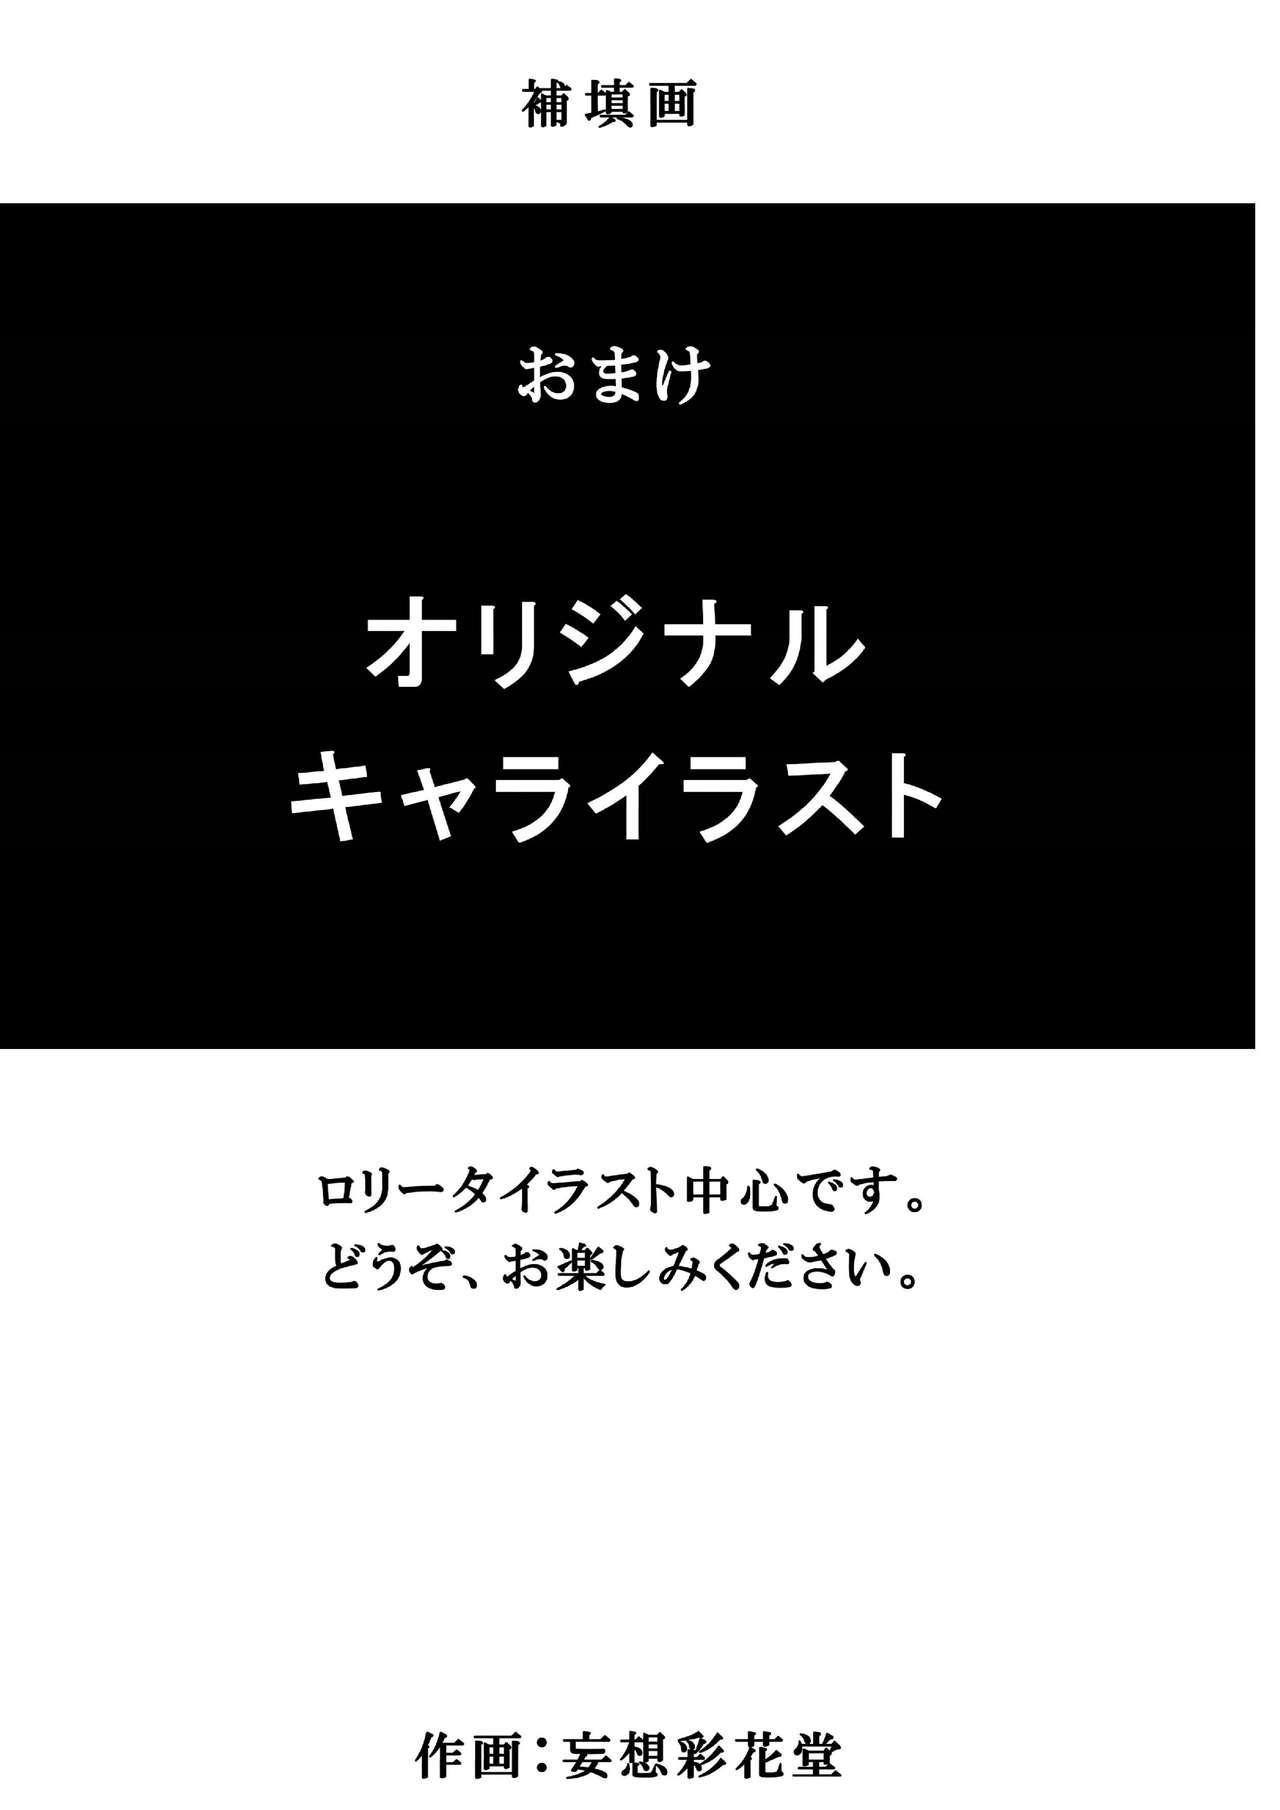 Original Tanpen Manga 2 Hon Date + Original Illust 26